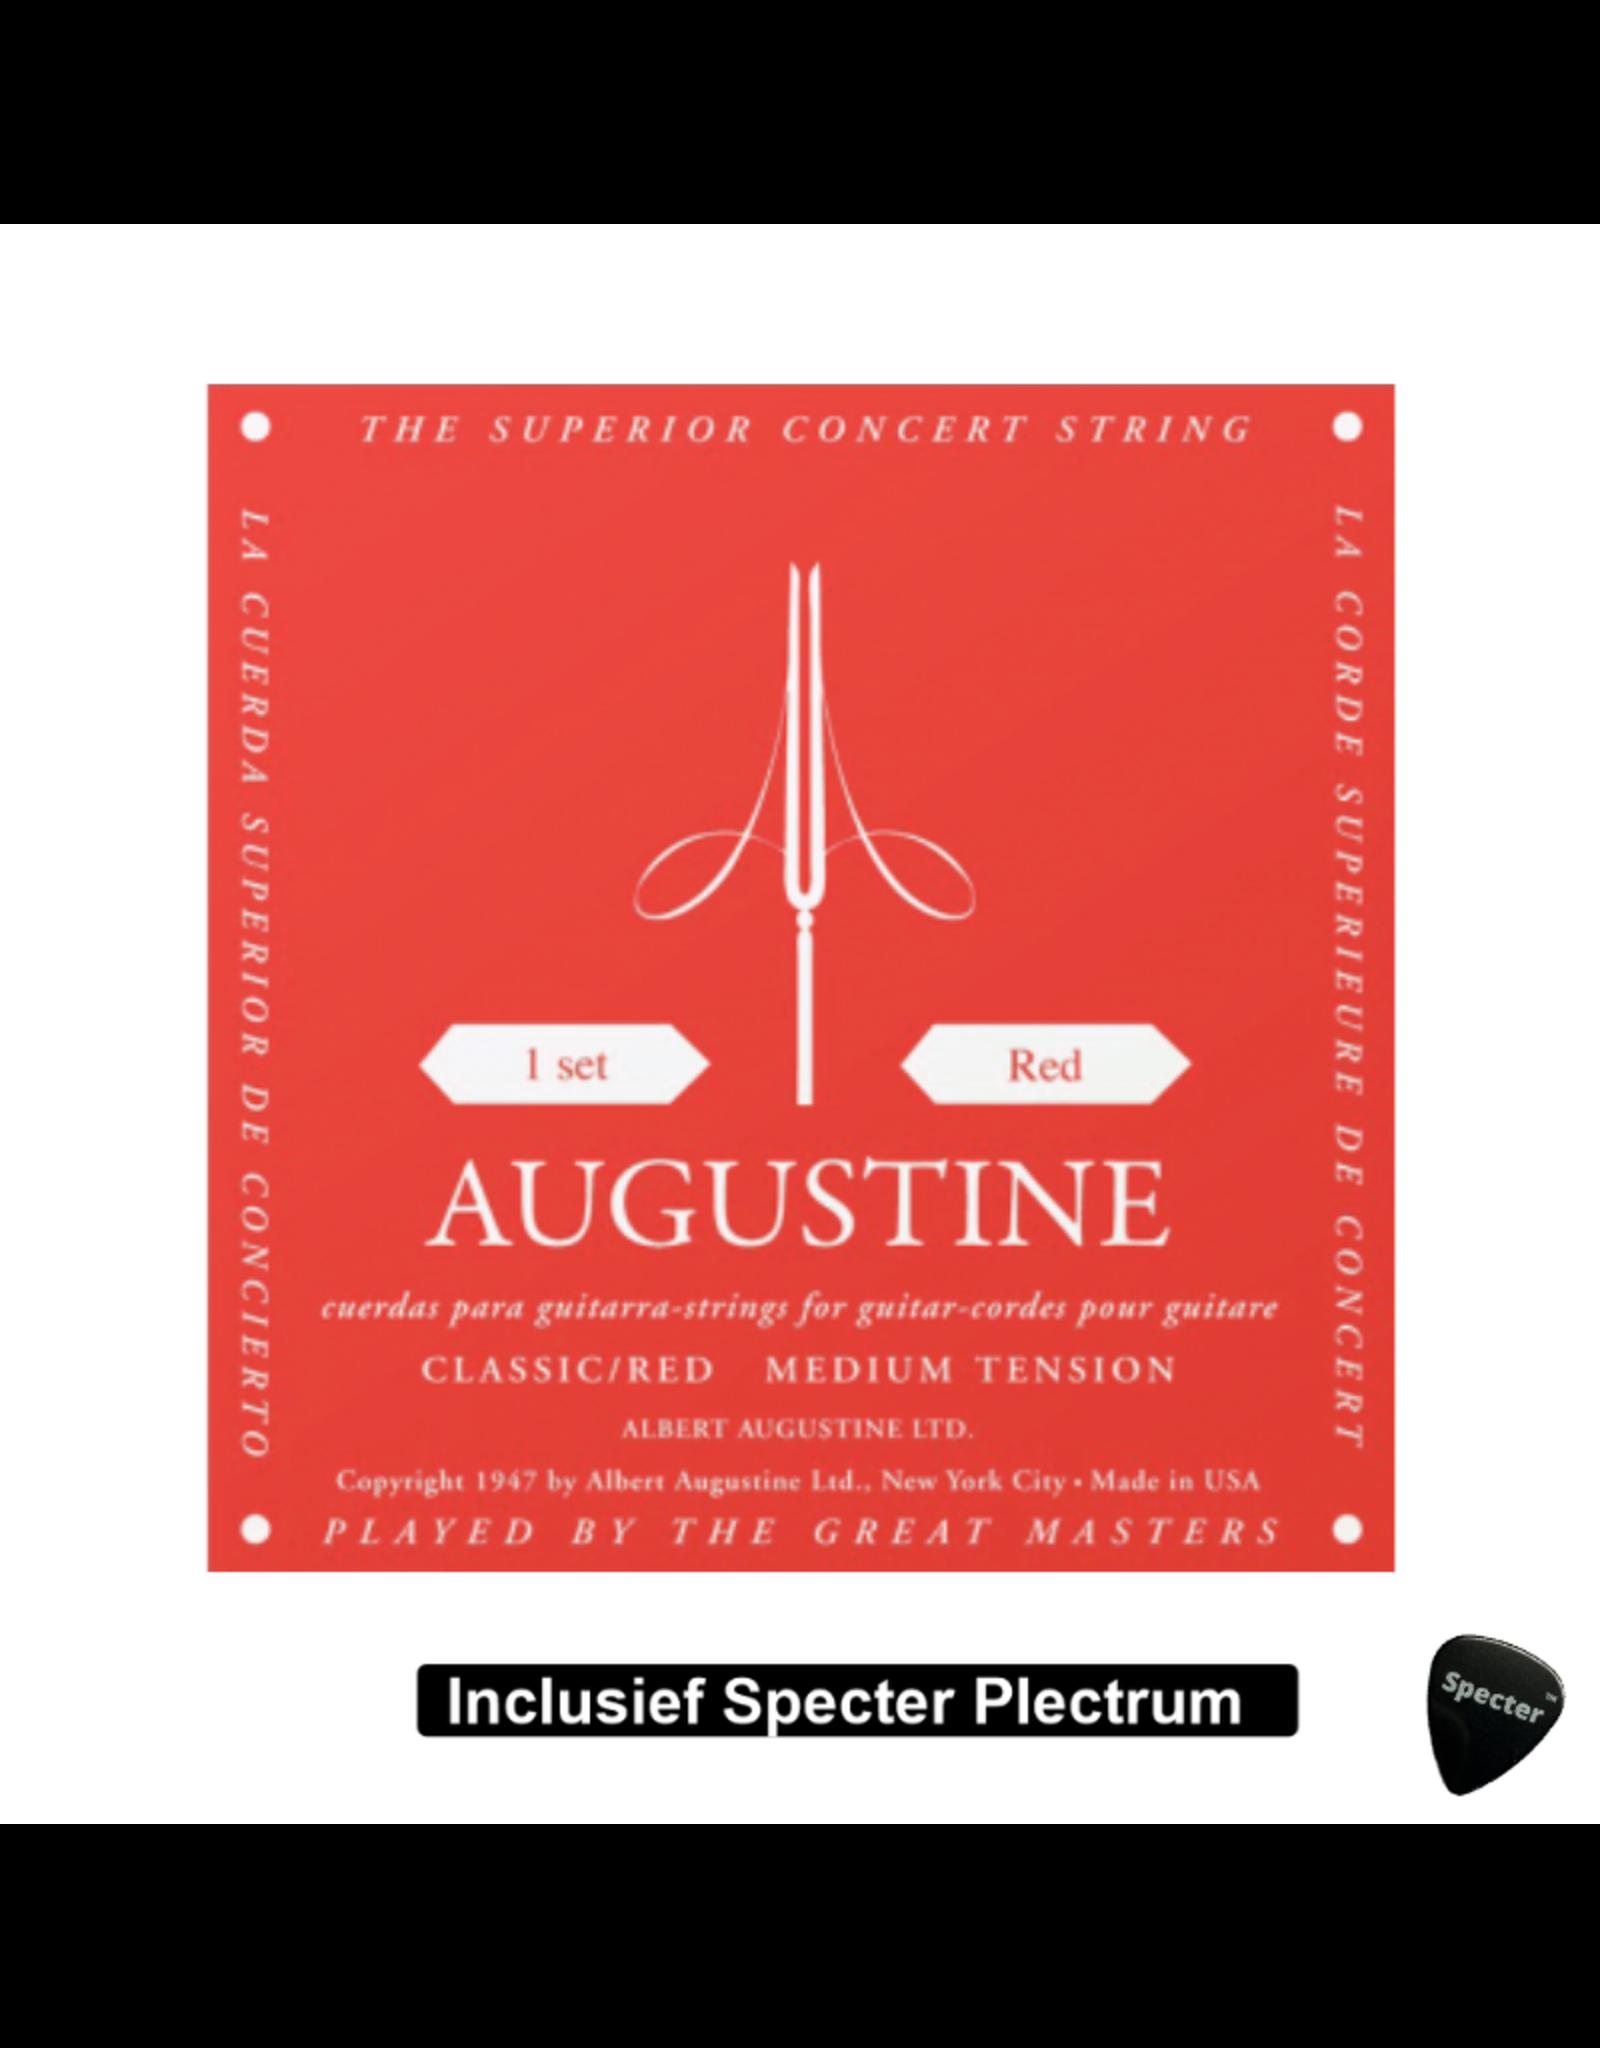 augustine Augustine - AU-RED Concert Snaren voor klassieke gitaar Met Plectrum | Snarenset | Klassieke gitaar